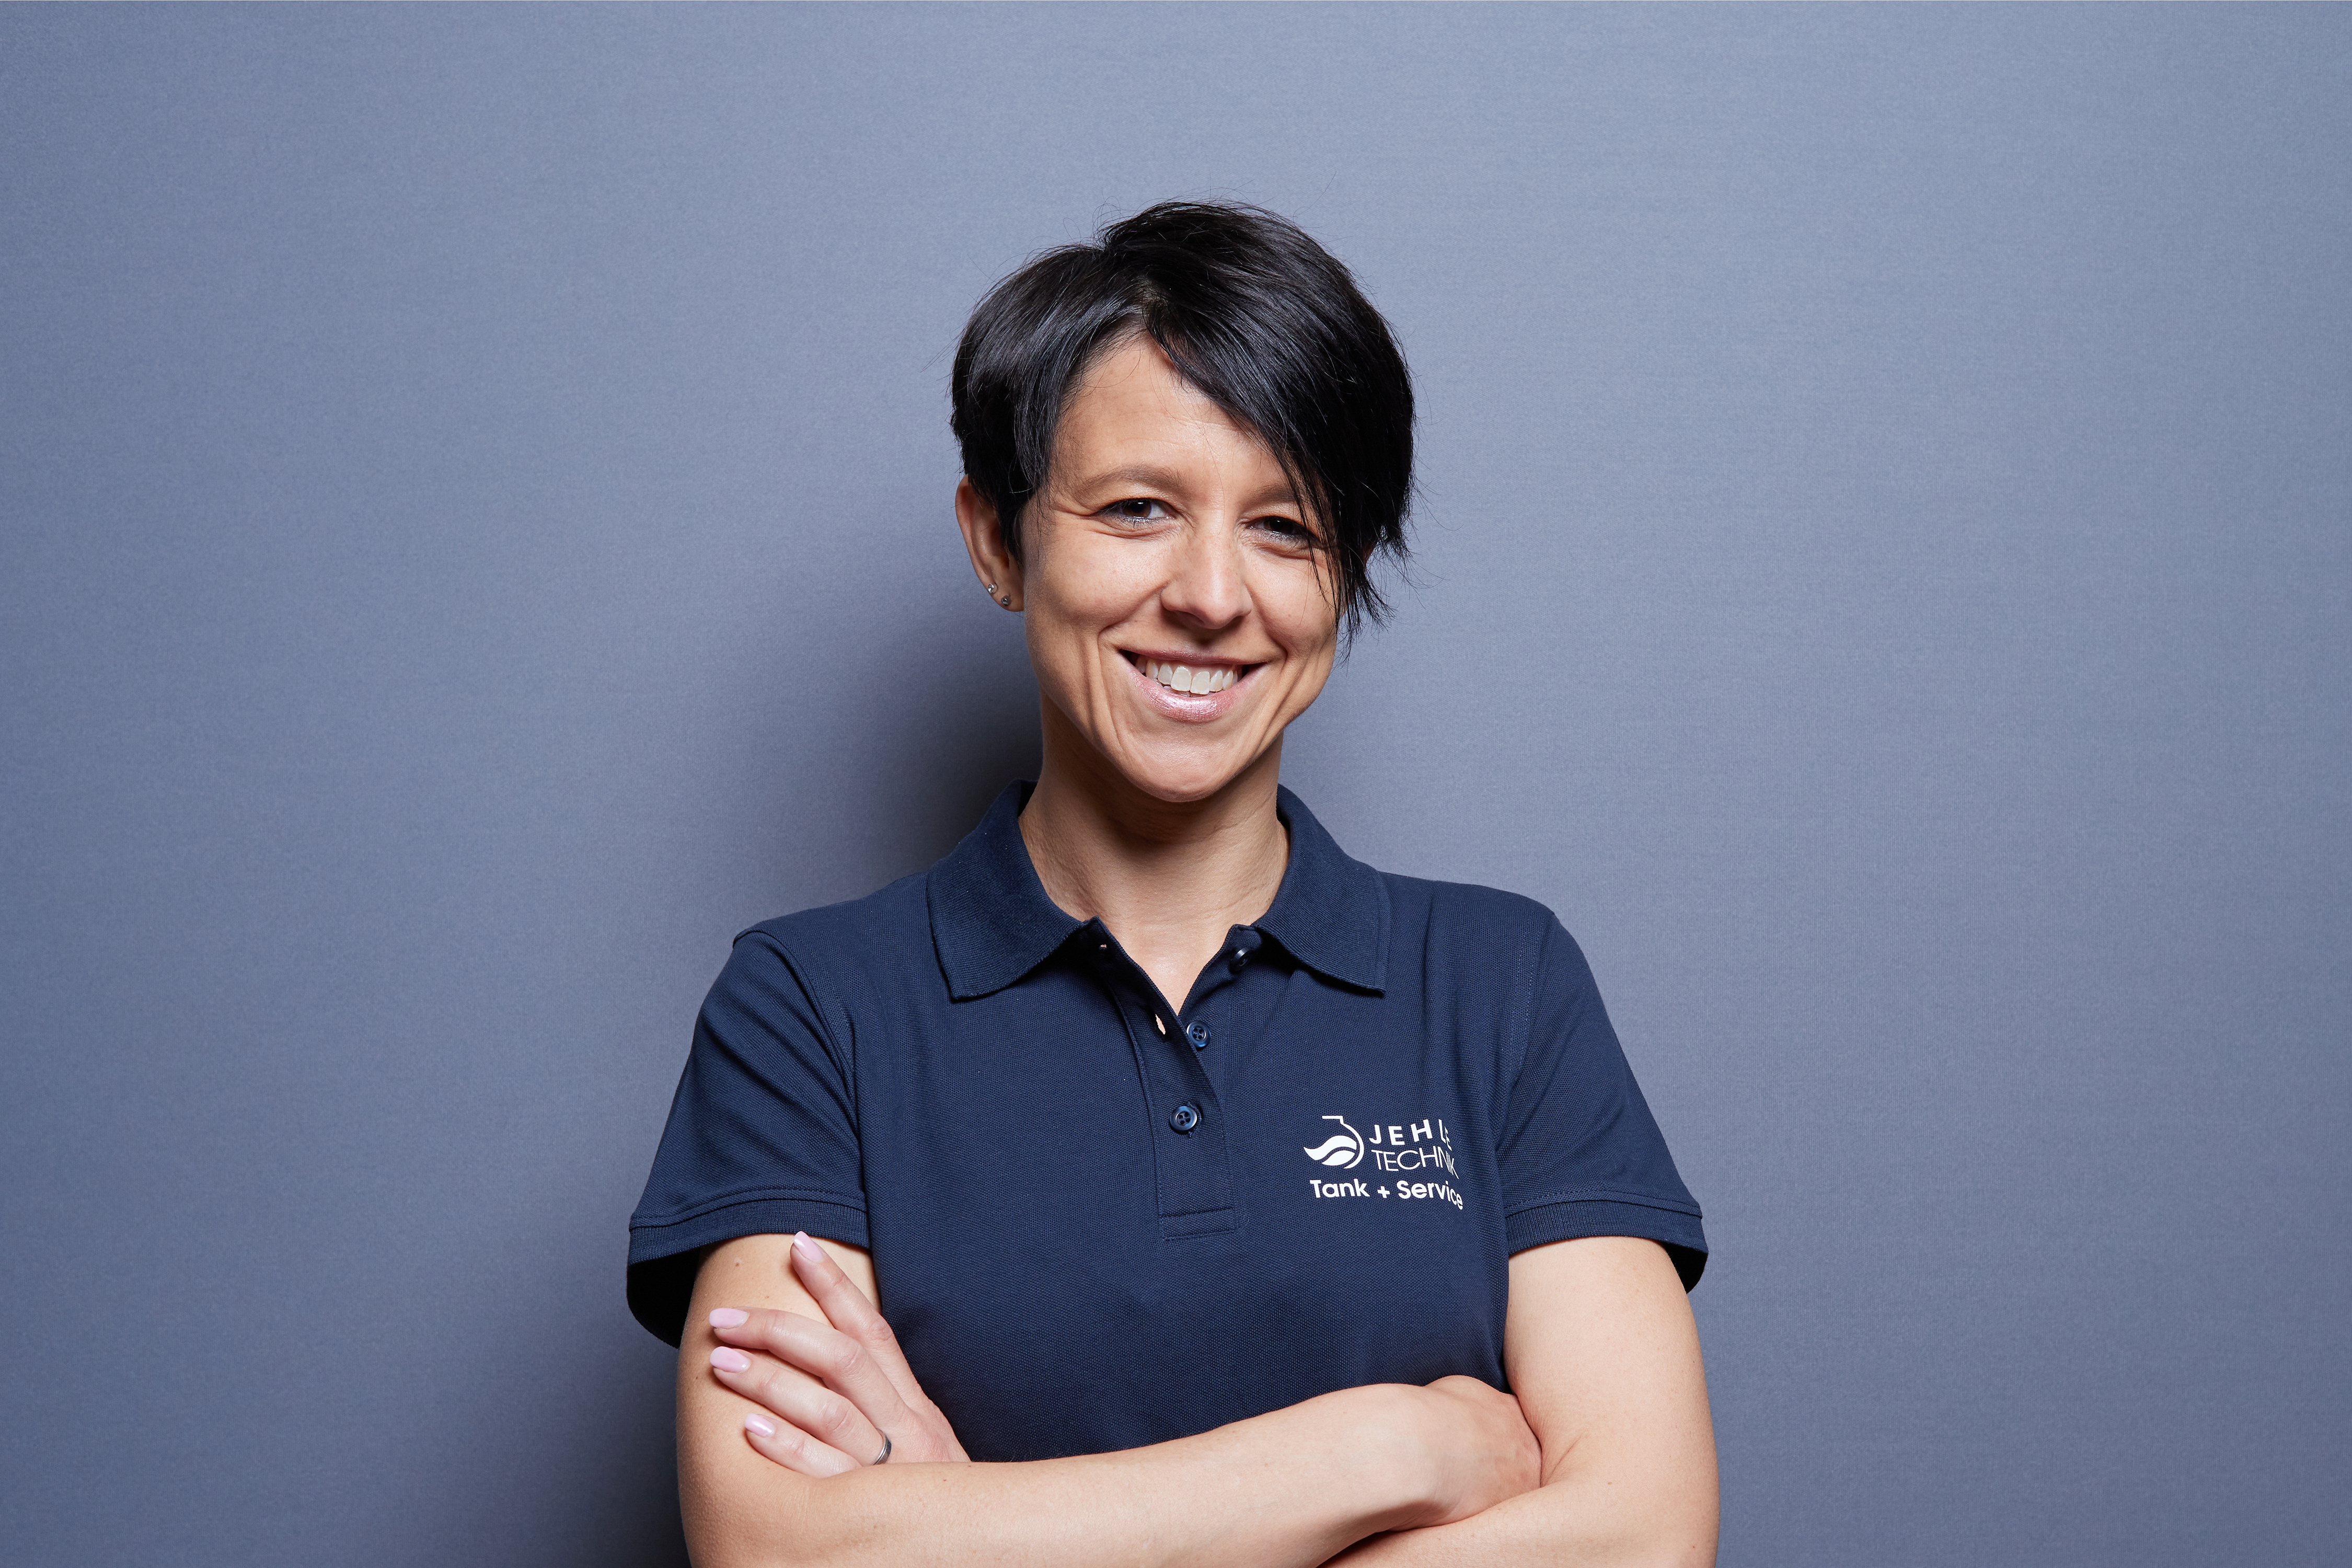 Tanja Seewald